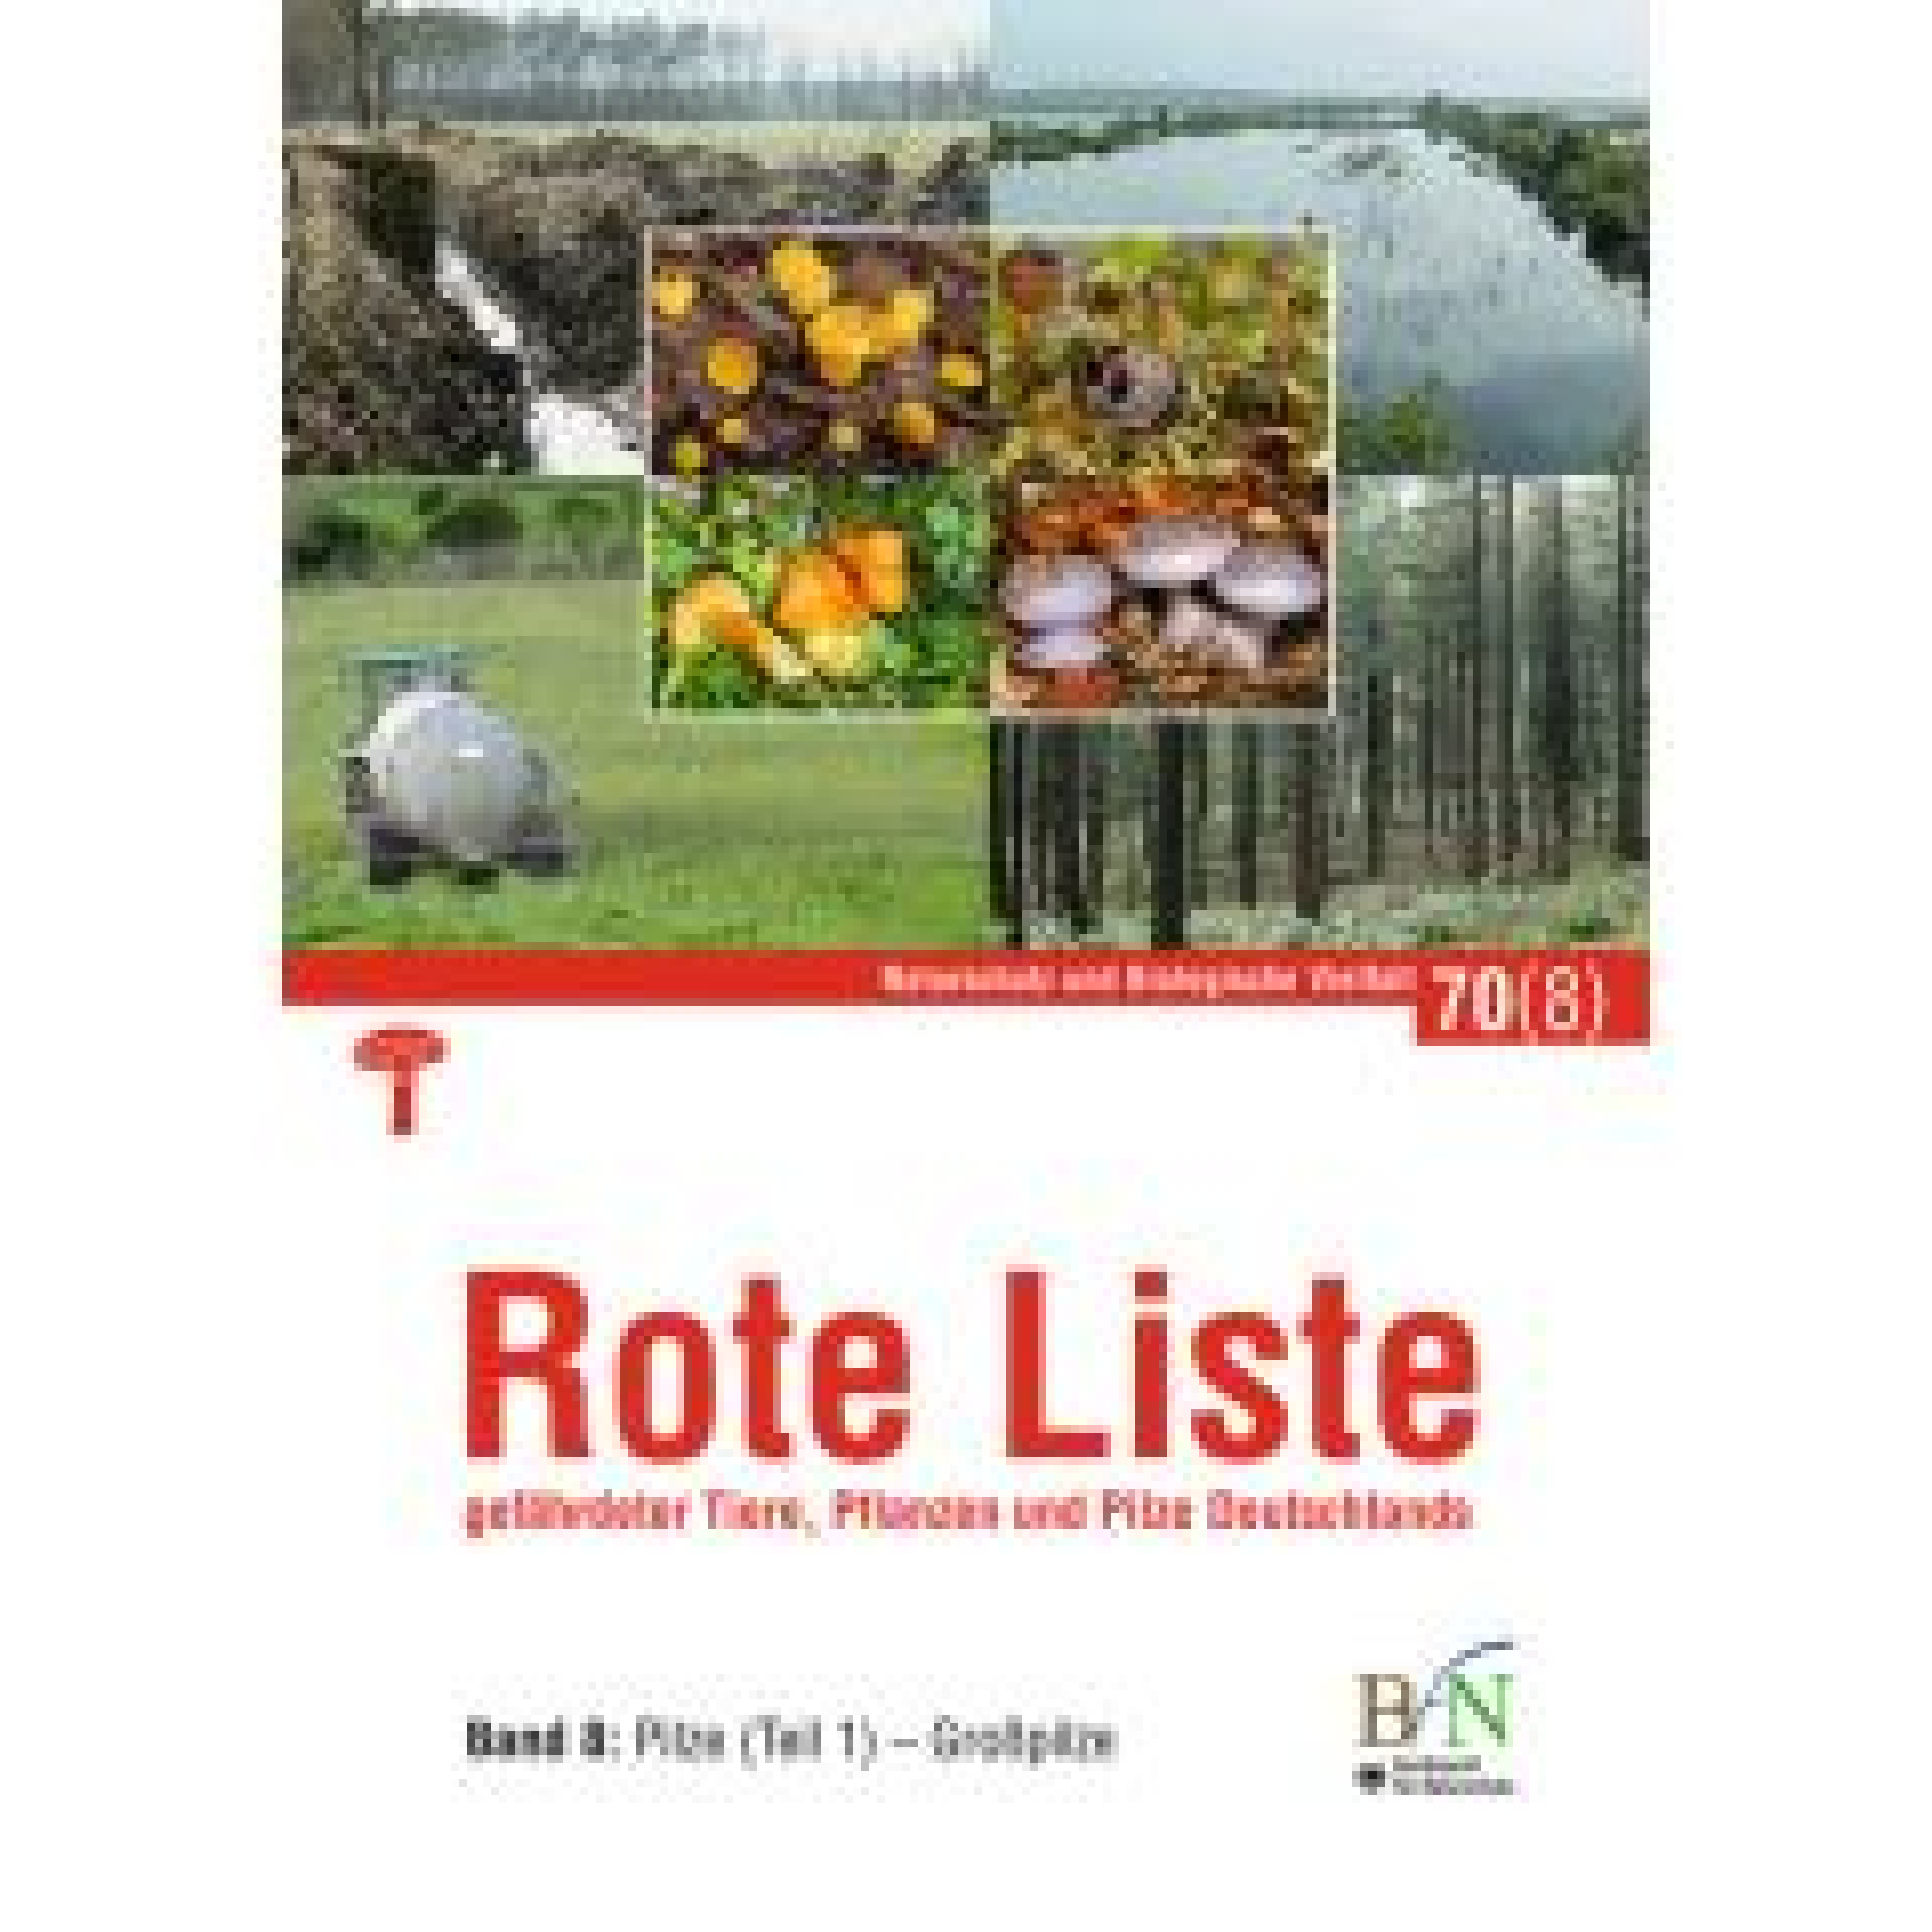 NaBiV Heft 70/8: Rote Liste gefährdeter Tiere, Pflanzen und Pilze Deutschlands - Bd 8: Pilze (Teil 1)-Großpilze